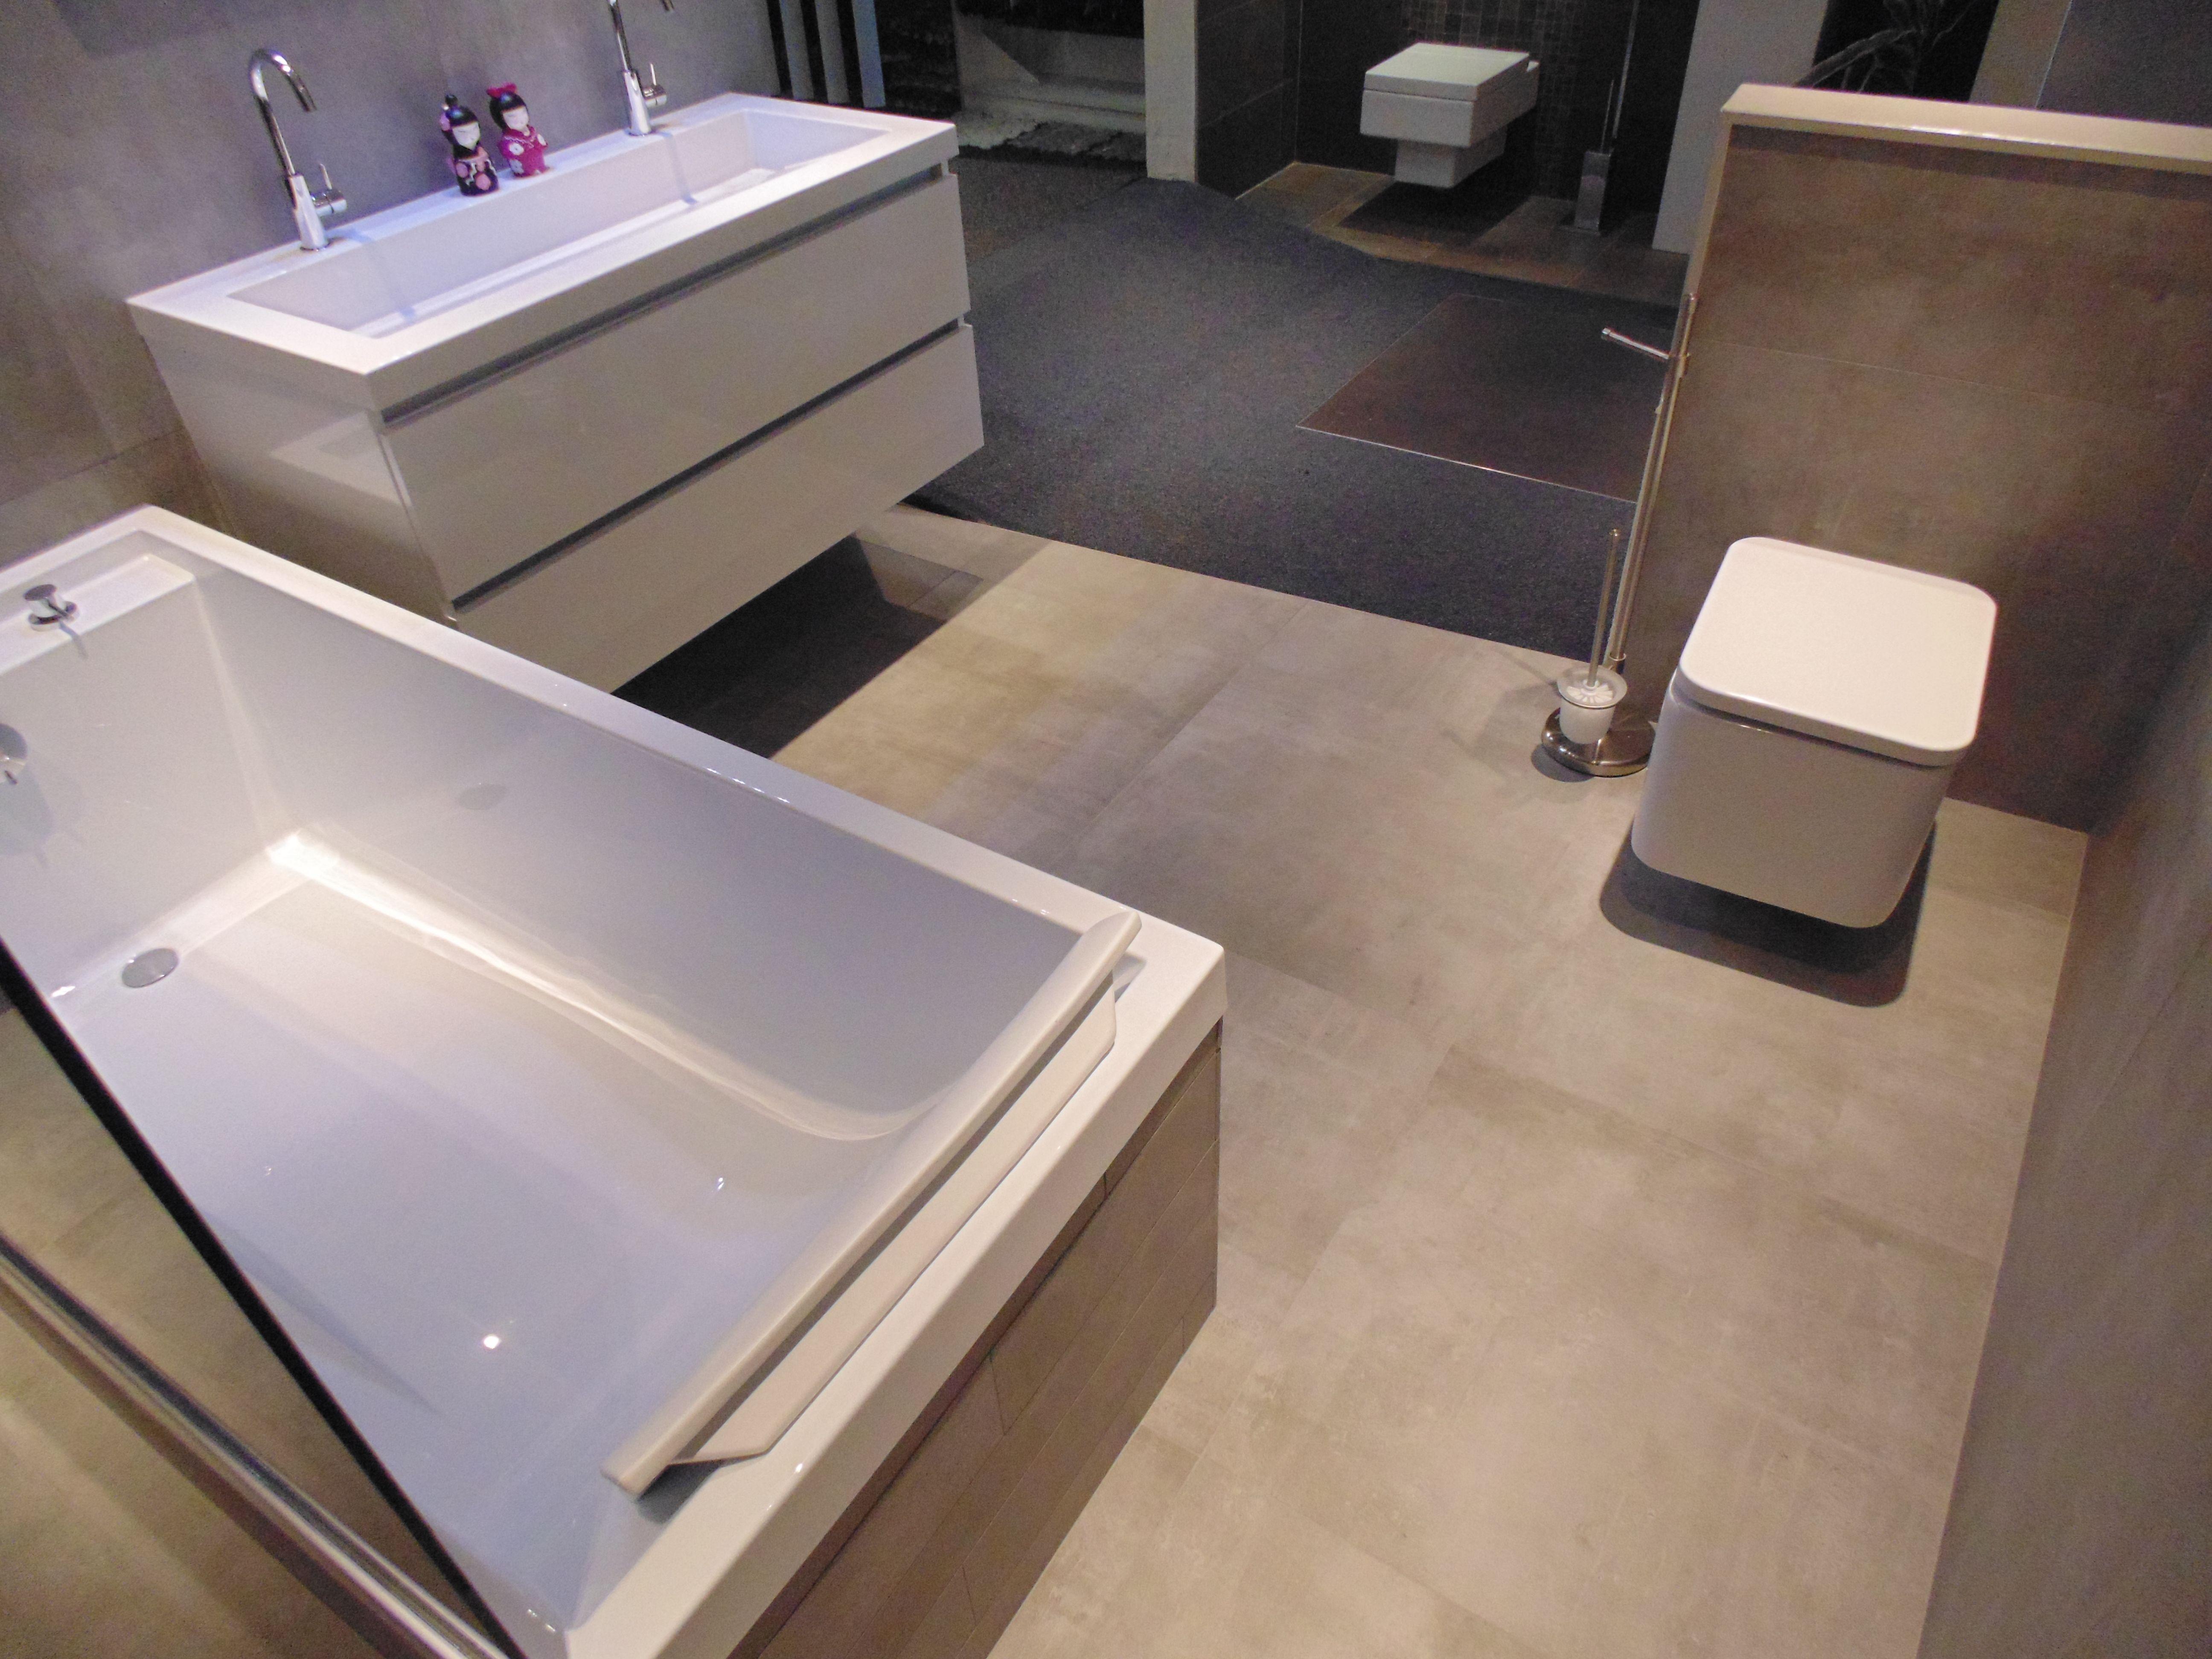 Badkamer opstelling met betonlook tegels | Betonlook tegels | Pinterest